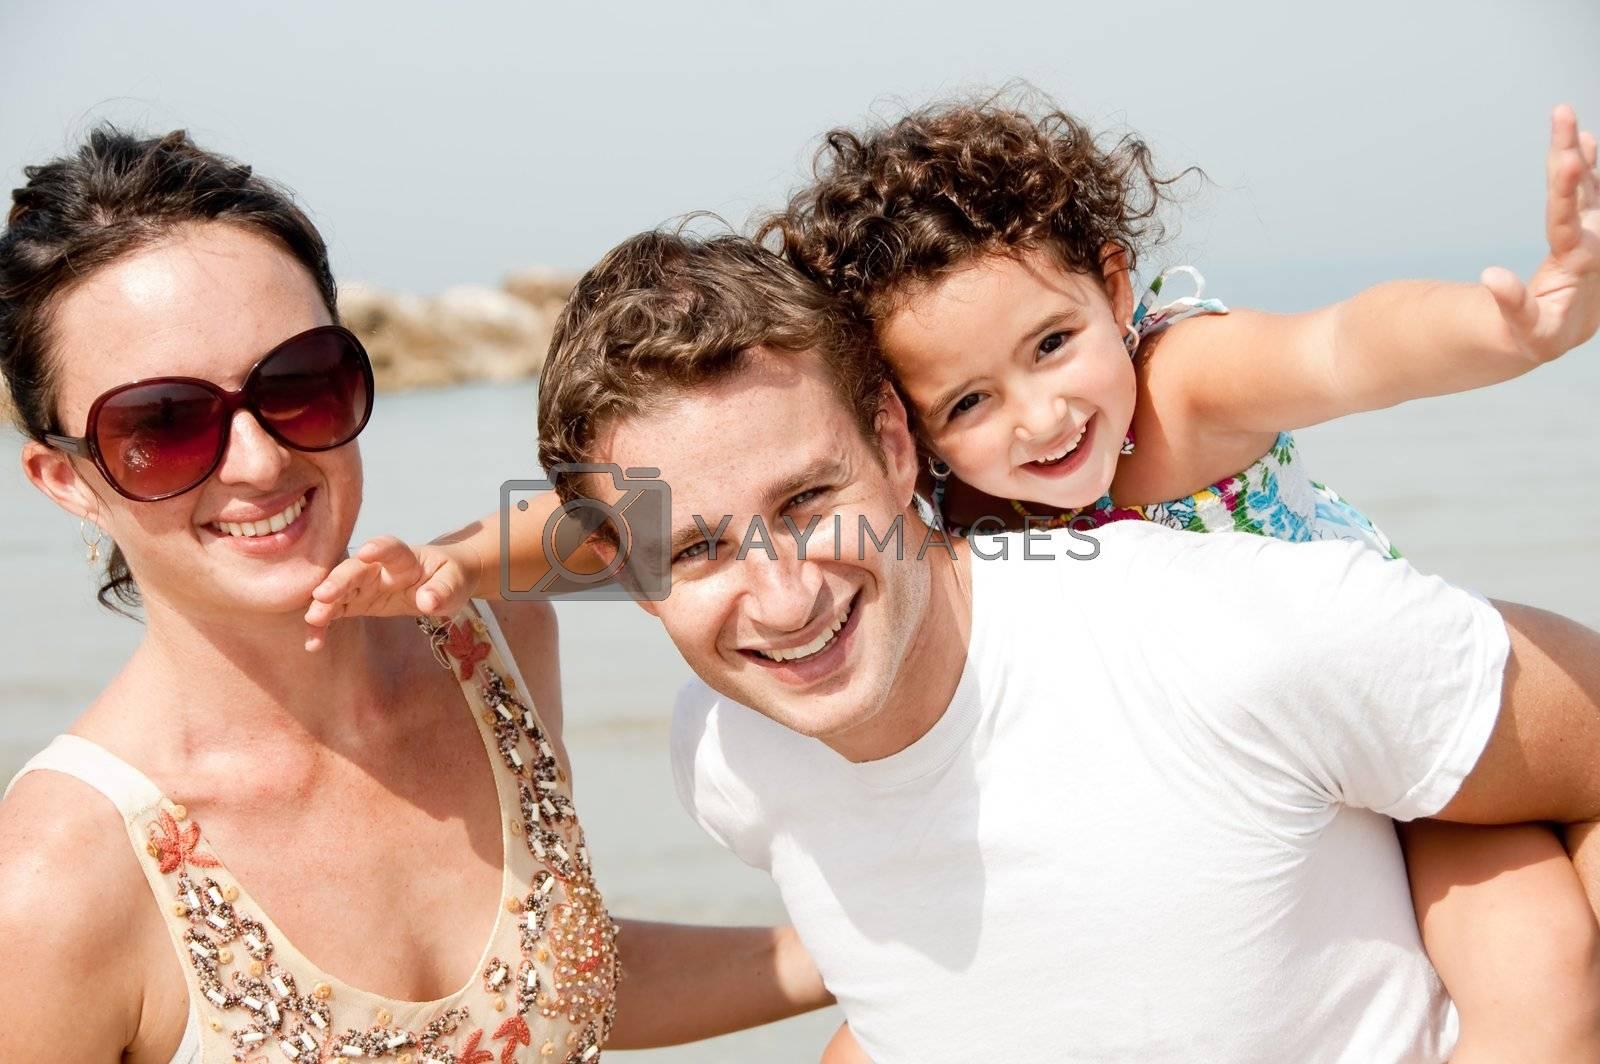 Family Having Fun by get4net